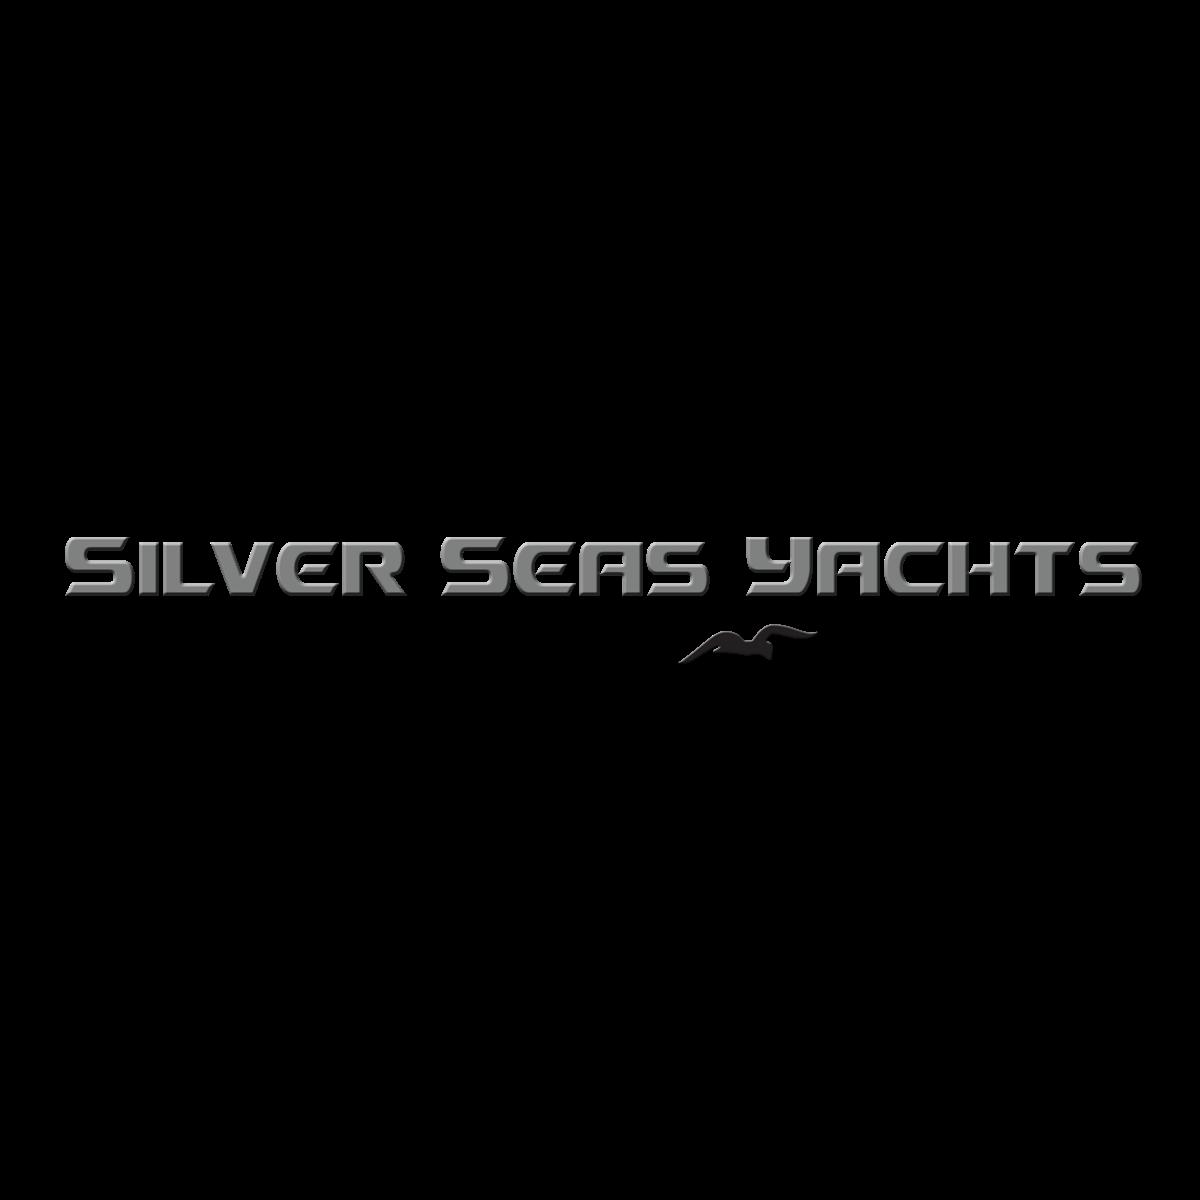 Silver Seas Yachts - Newport Beach